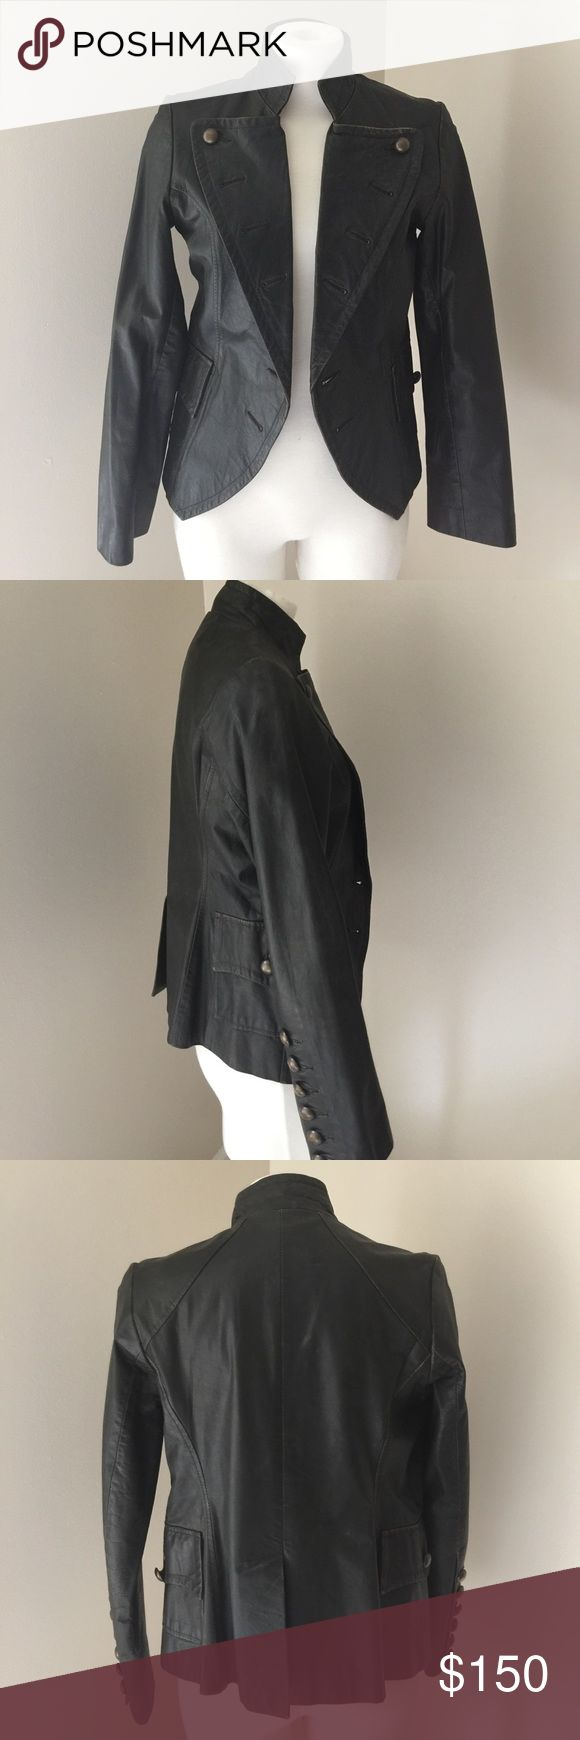 🎉SALE🎉Cino vintage leather jacket Cino vintage leather jacket cino Jackets & Coats